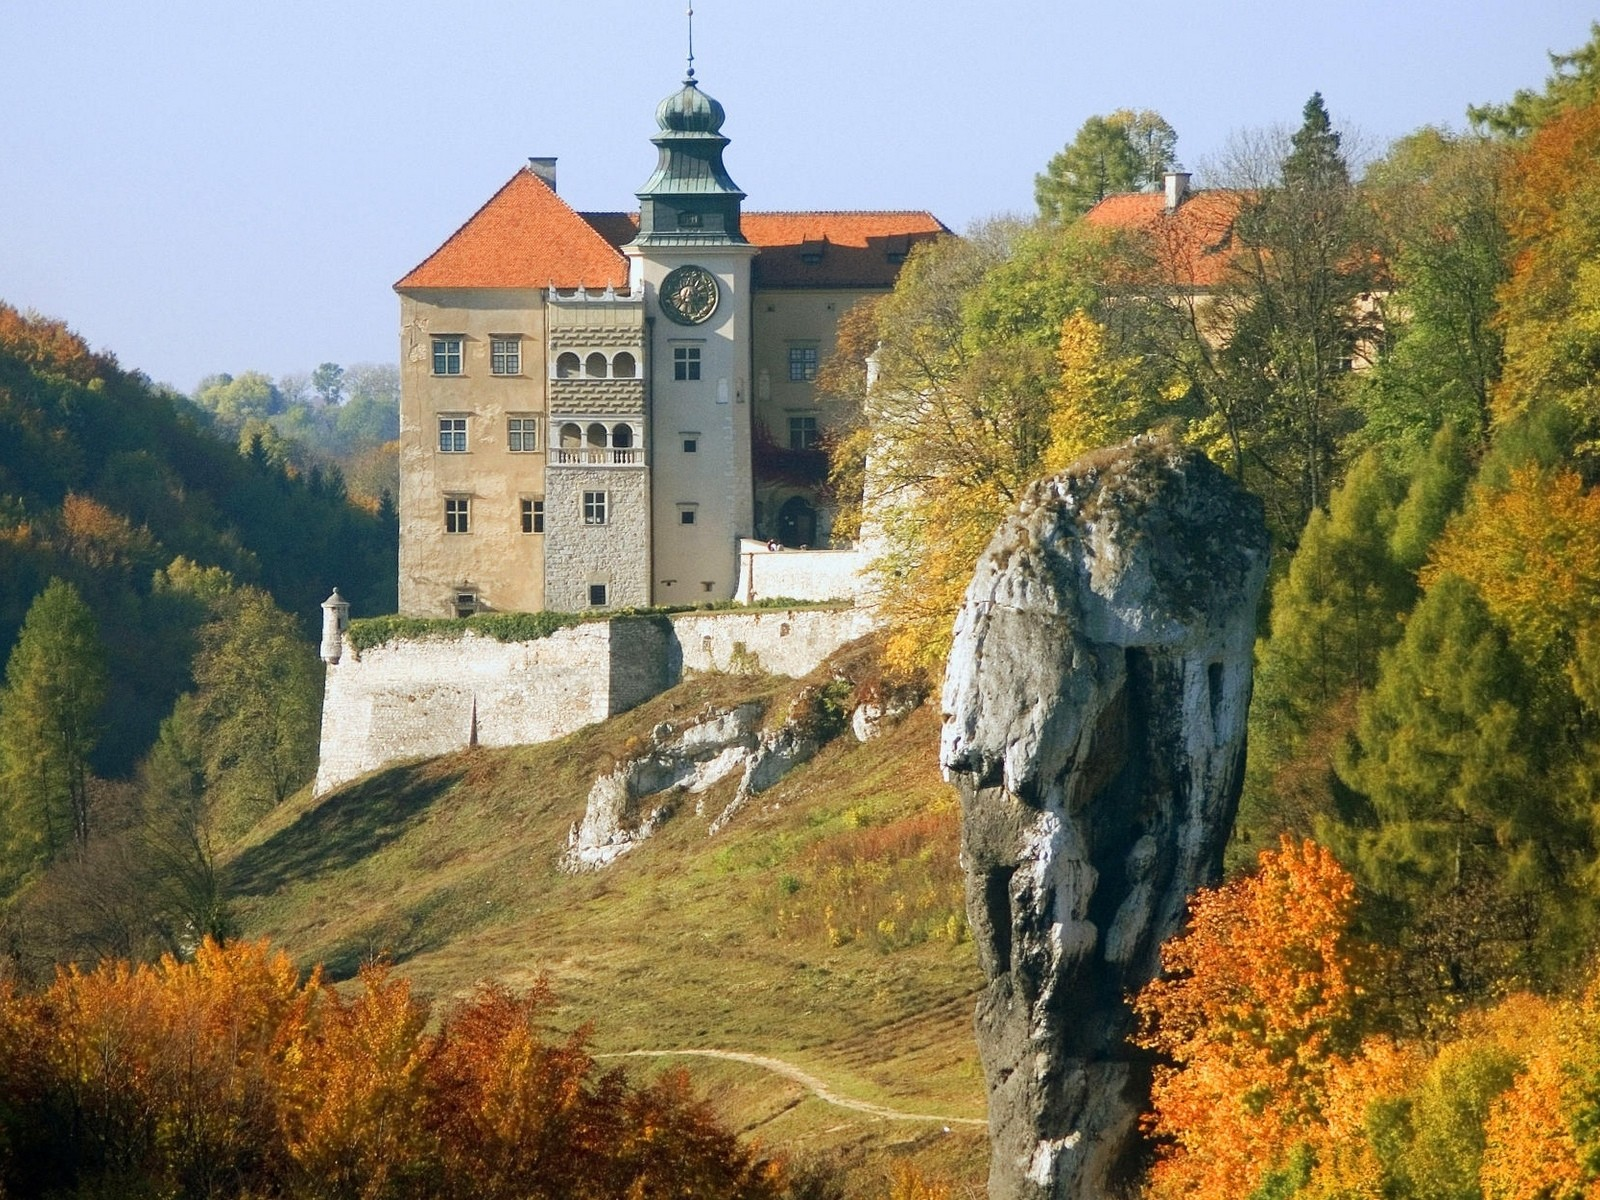 General 1600x1200 castle landscape Pieskowa Skała Poland old building fall